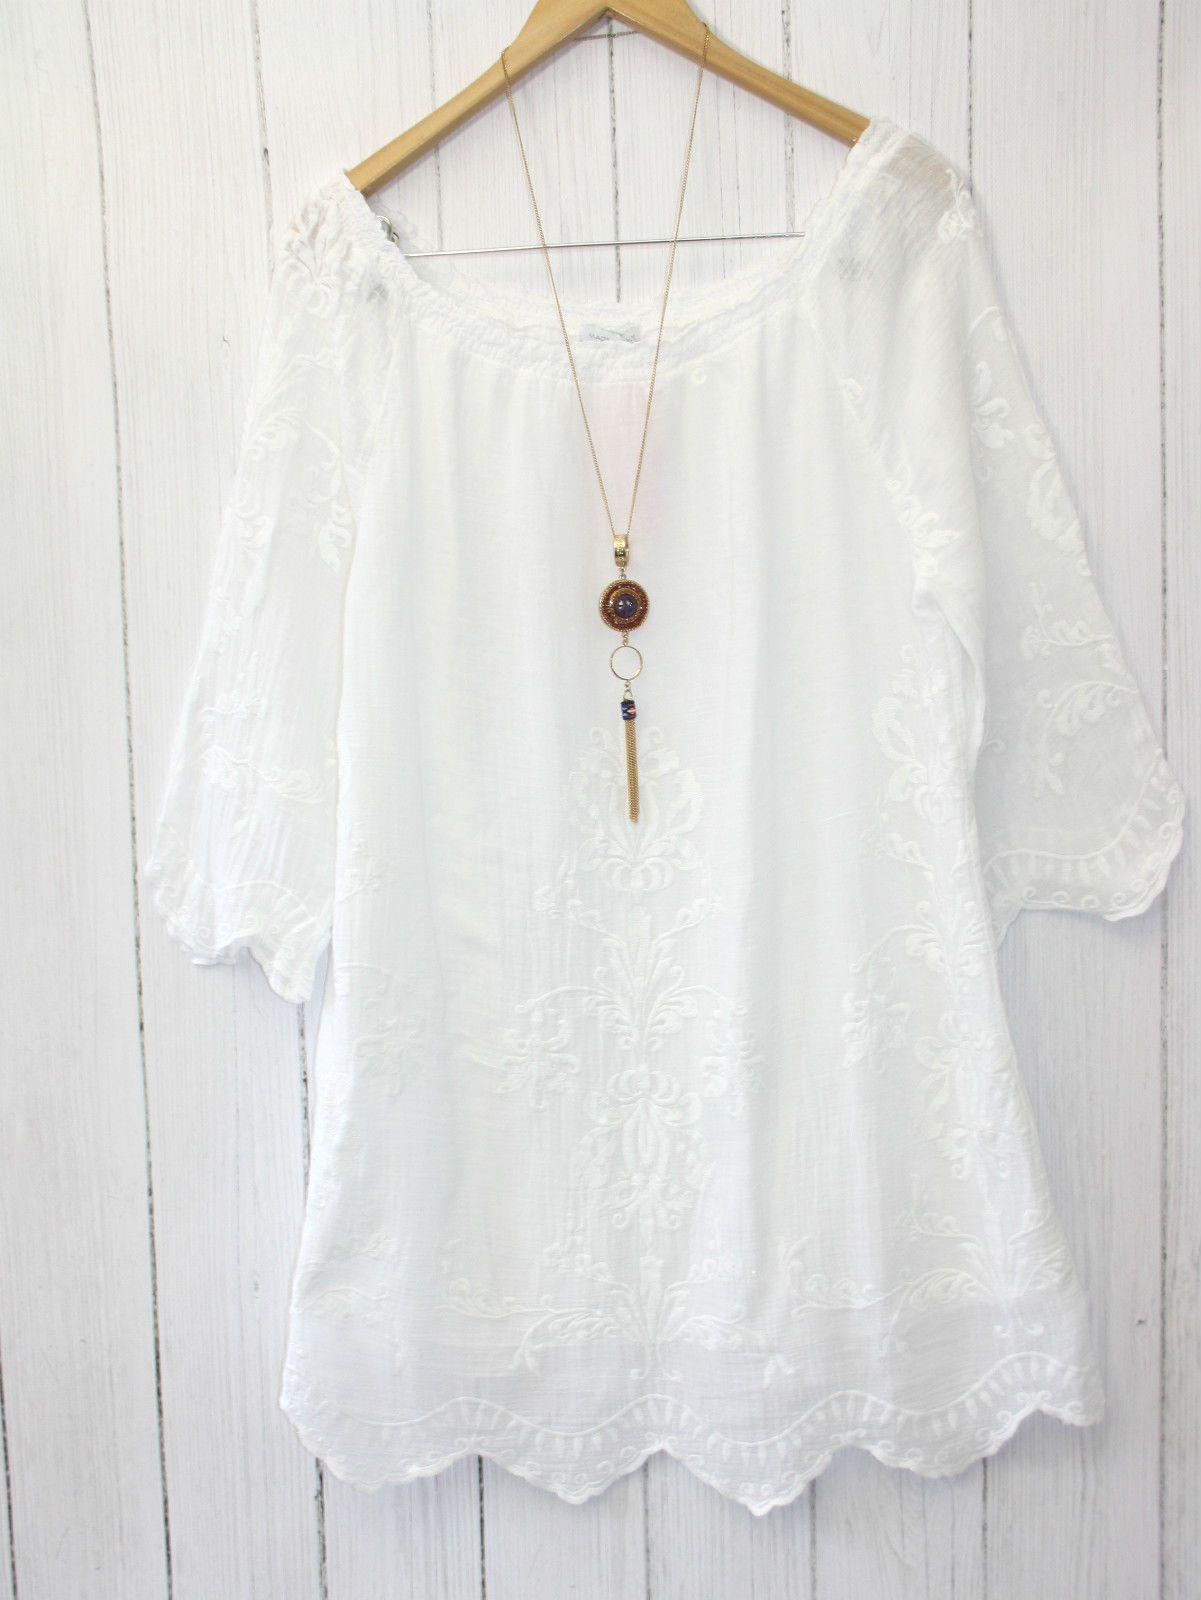 e7b7234df261f9 Diana Italy Tunika Bluse 38 40 42 Boho Hippie Style Stickerei Weiß NEU |  eBay